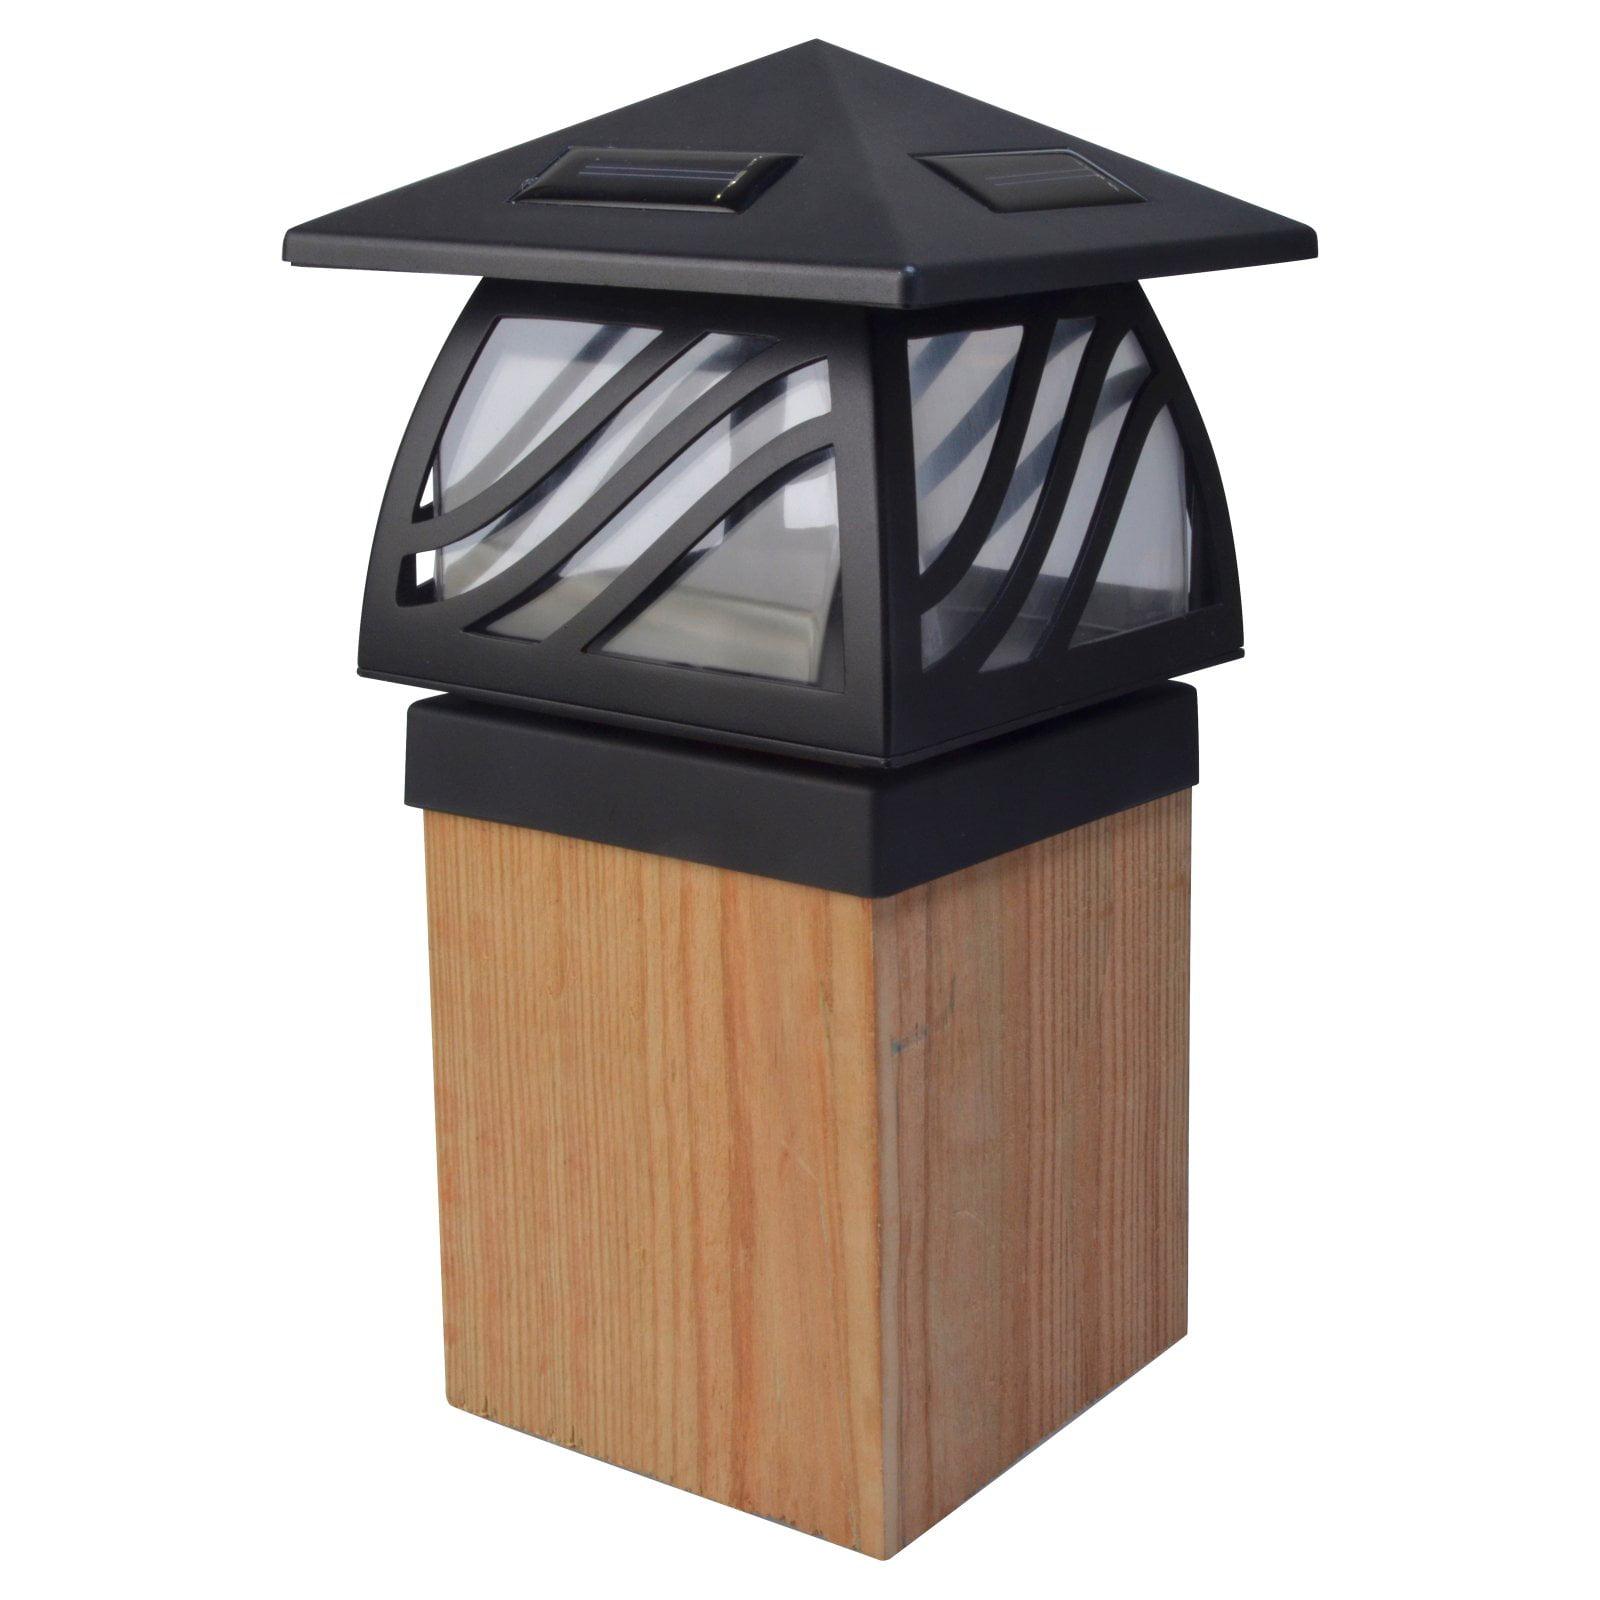 Moonrays 91196 Solar Powered LED Post Cap Light, Black Finish